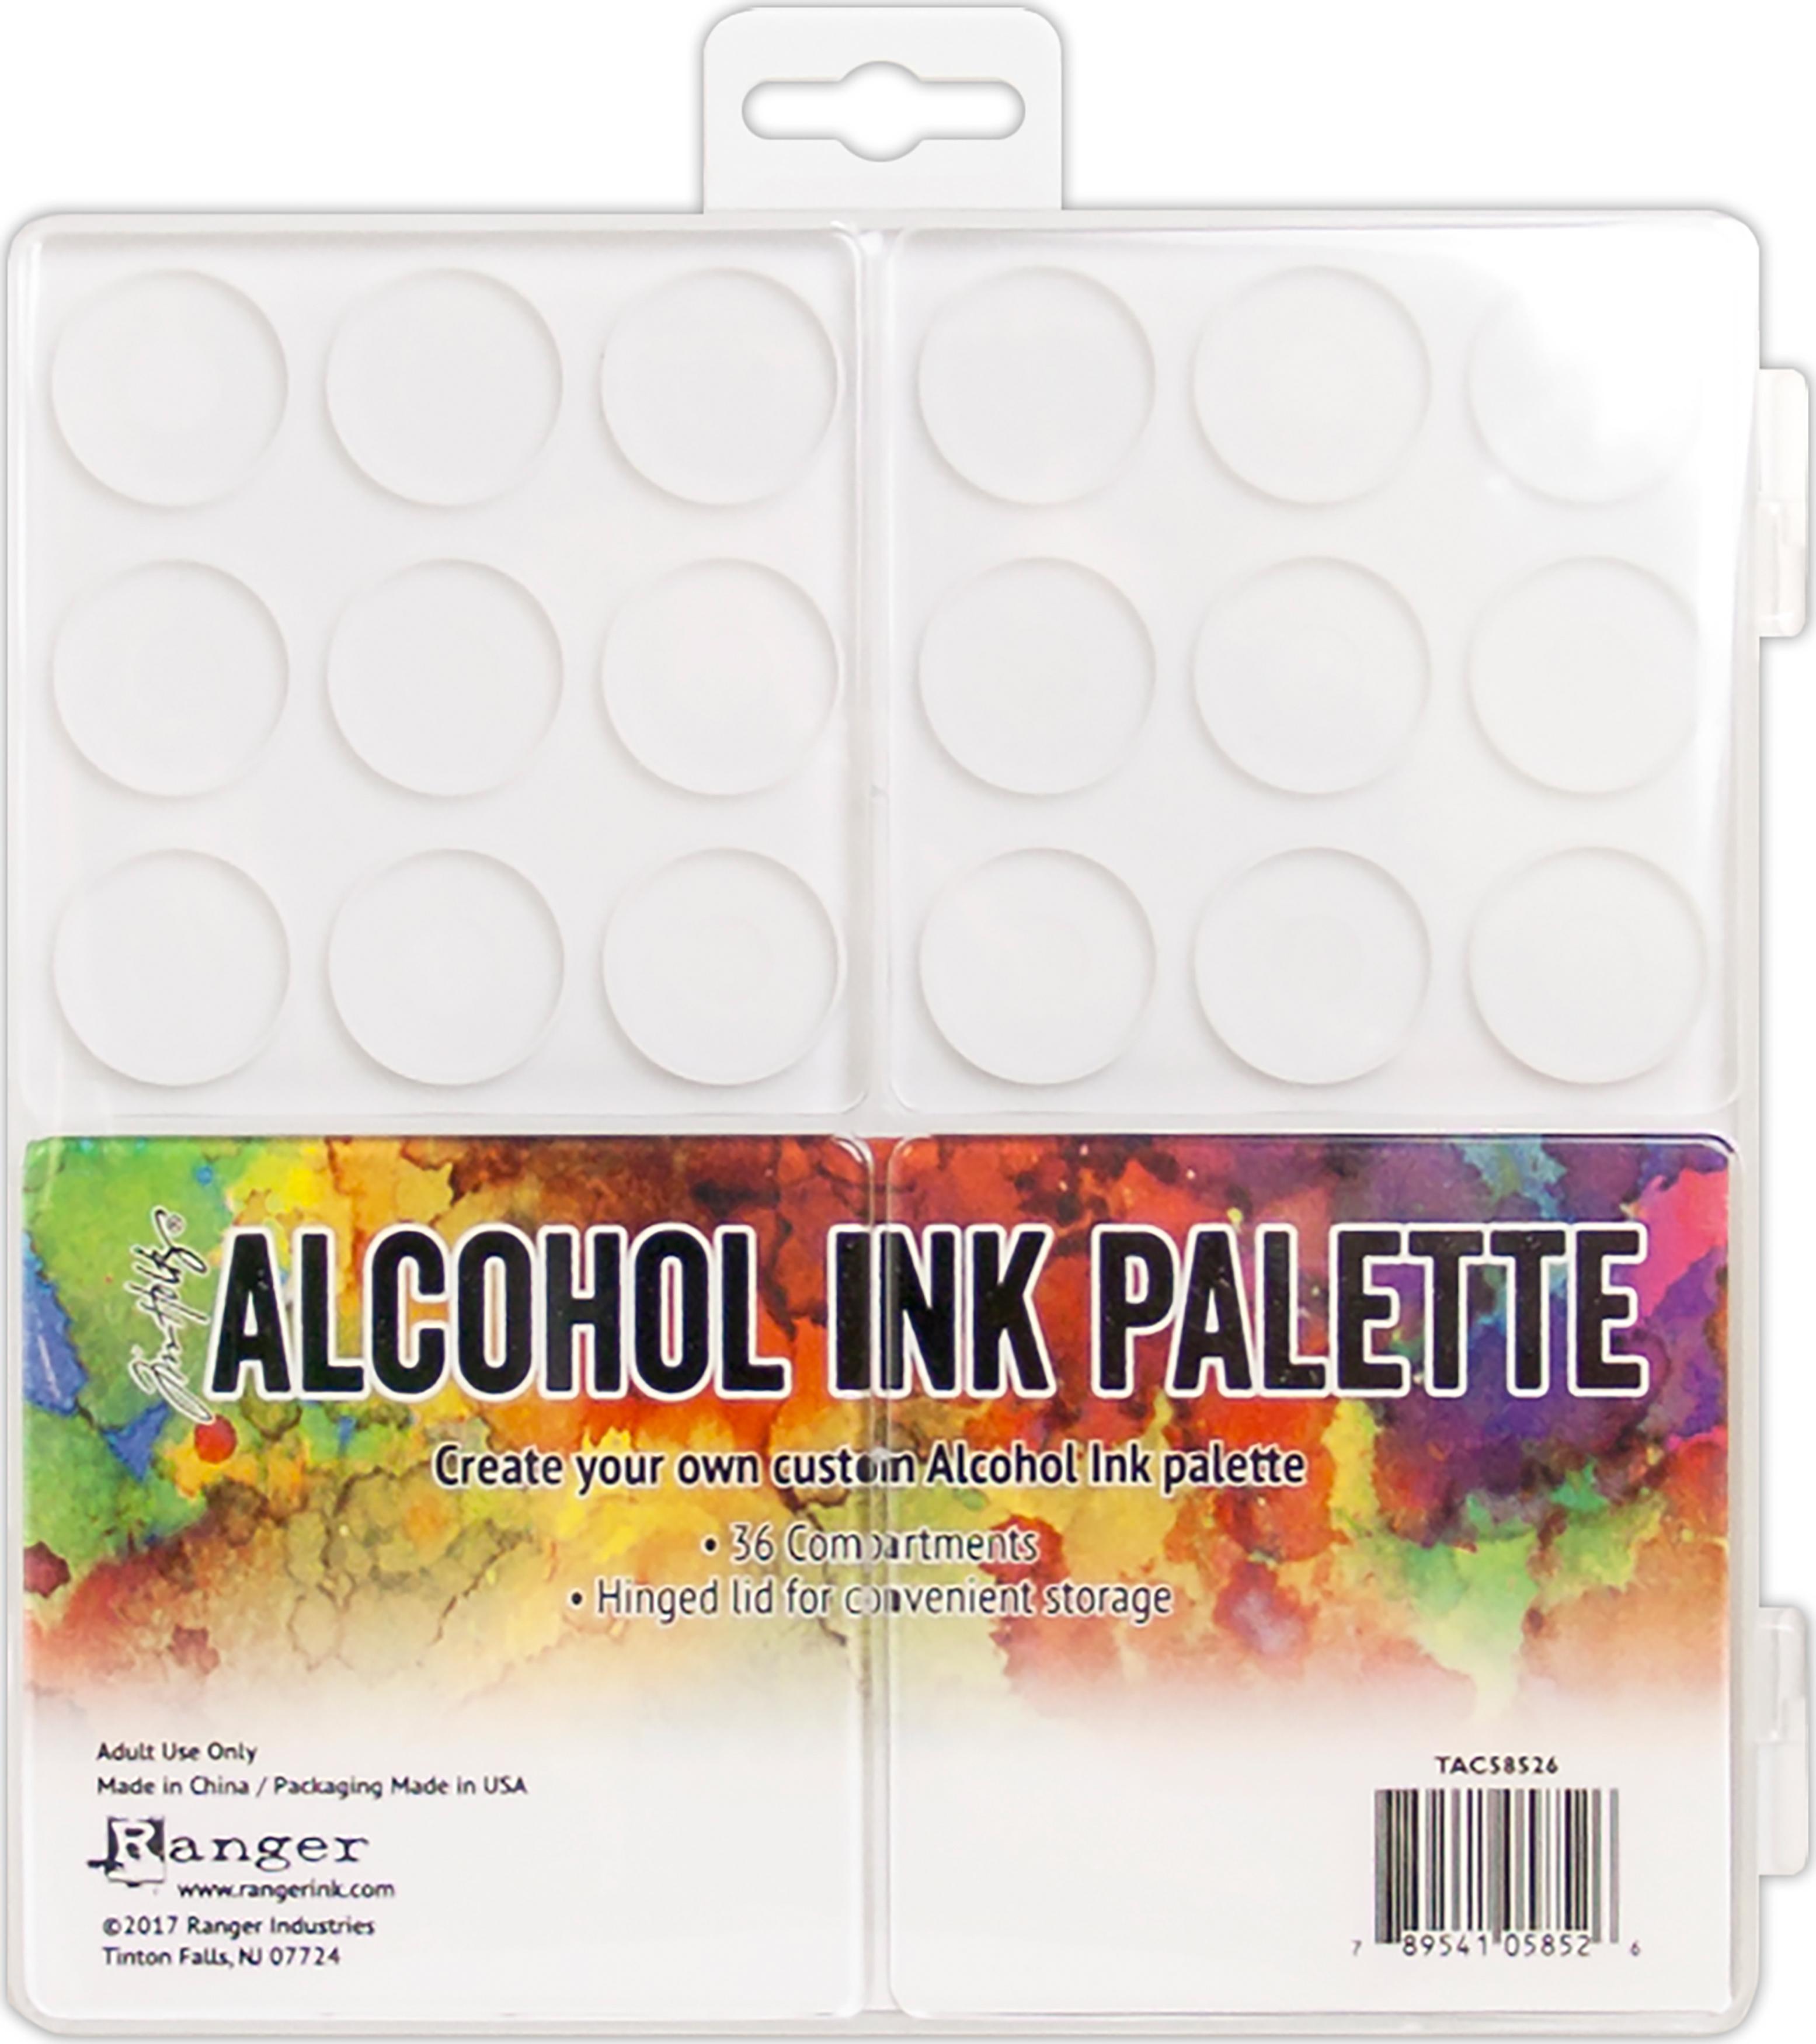 Alcohol Ink Palette